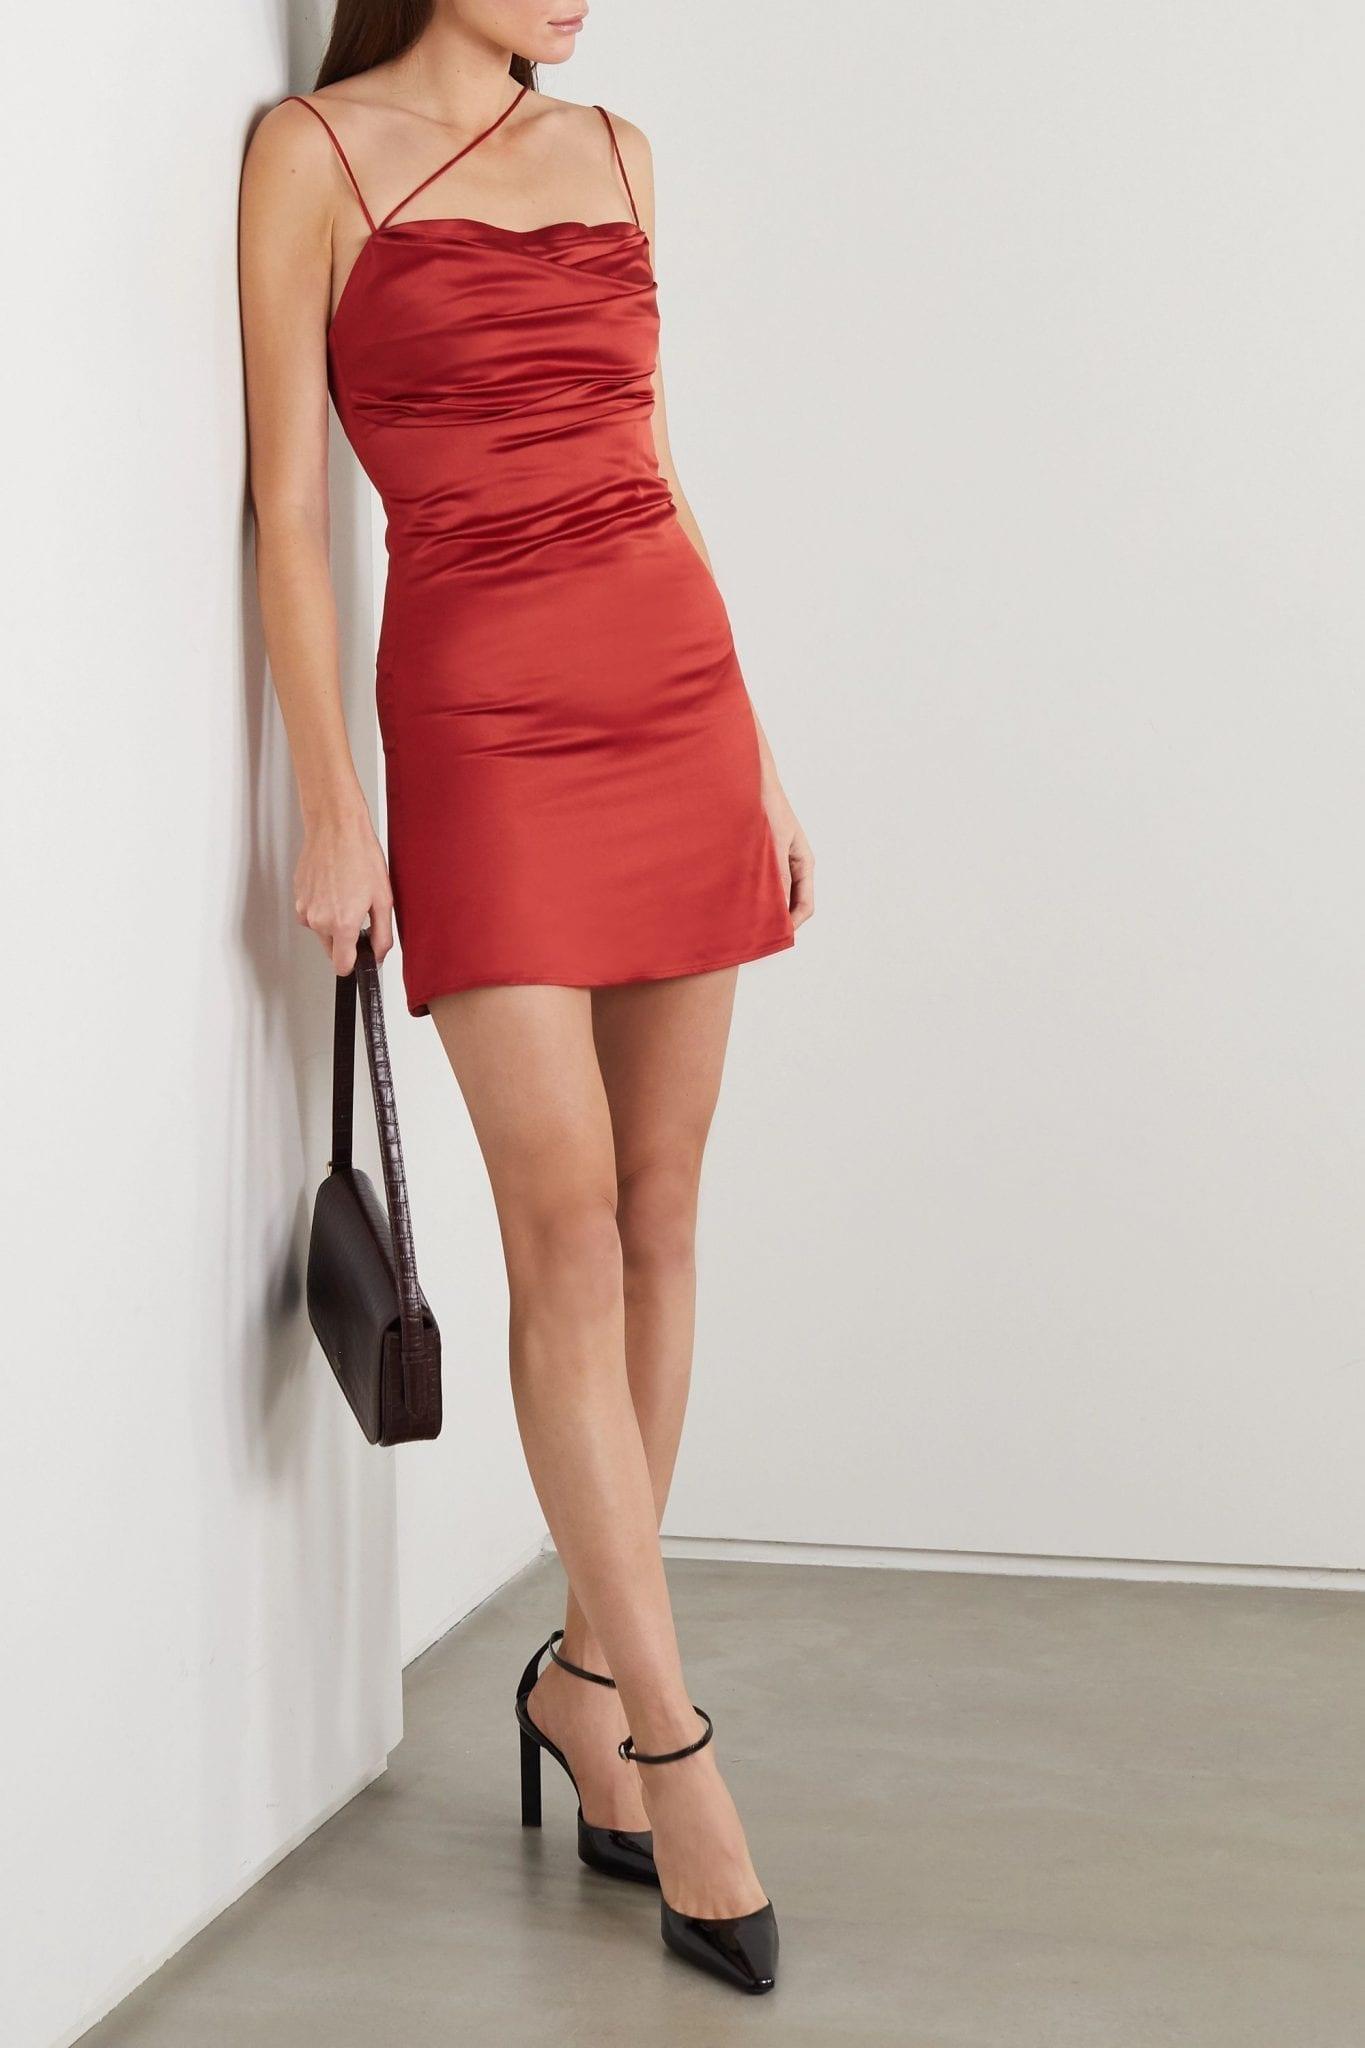 DE LA VALI Frisco Draped Satin Mini Dress